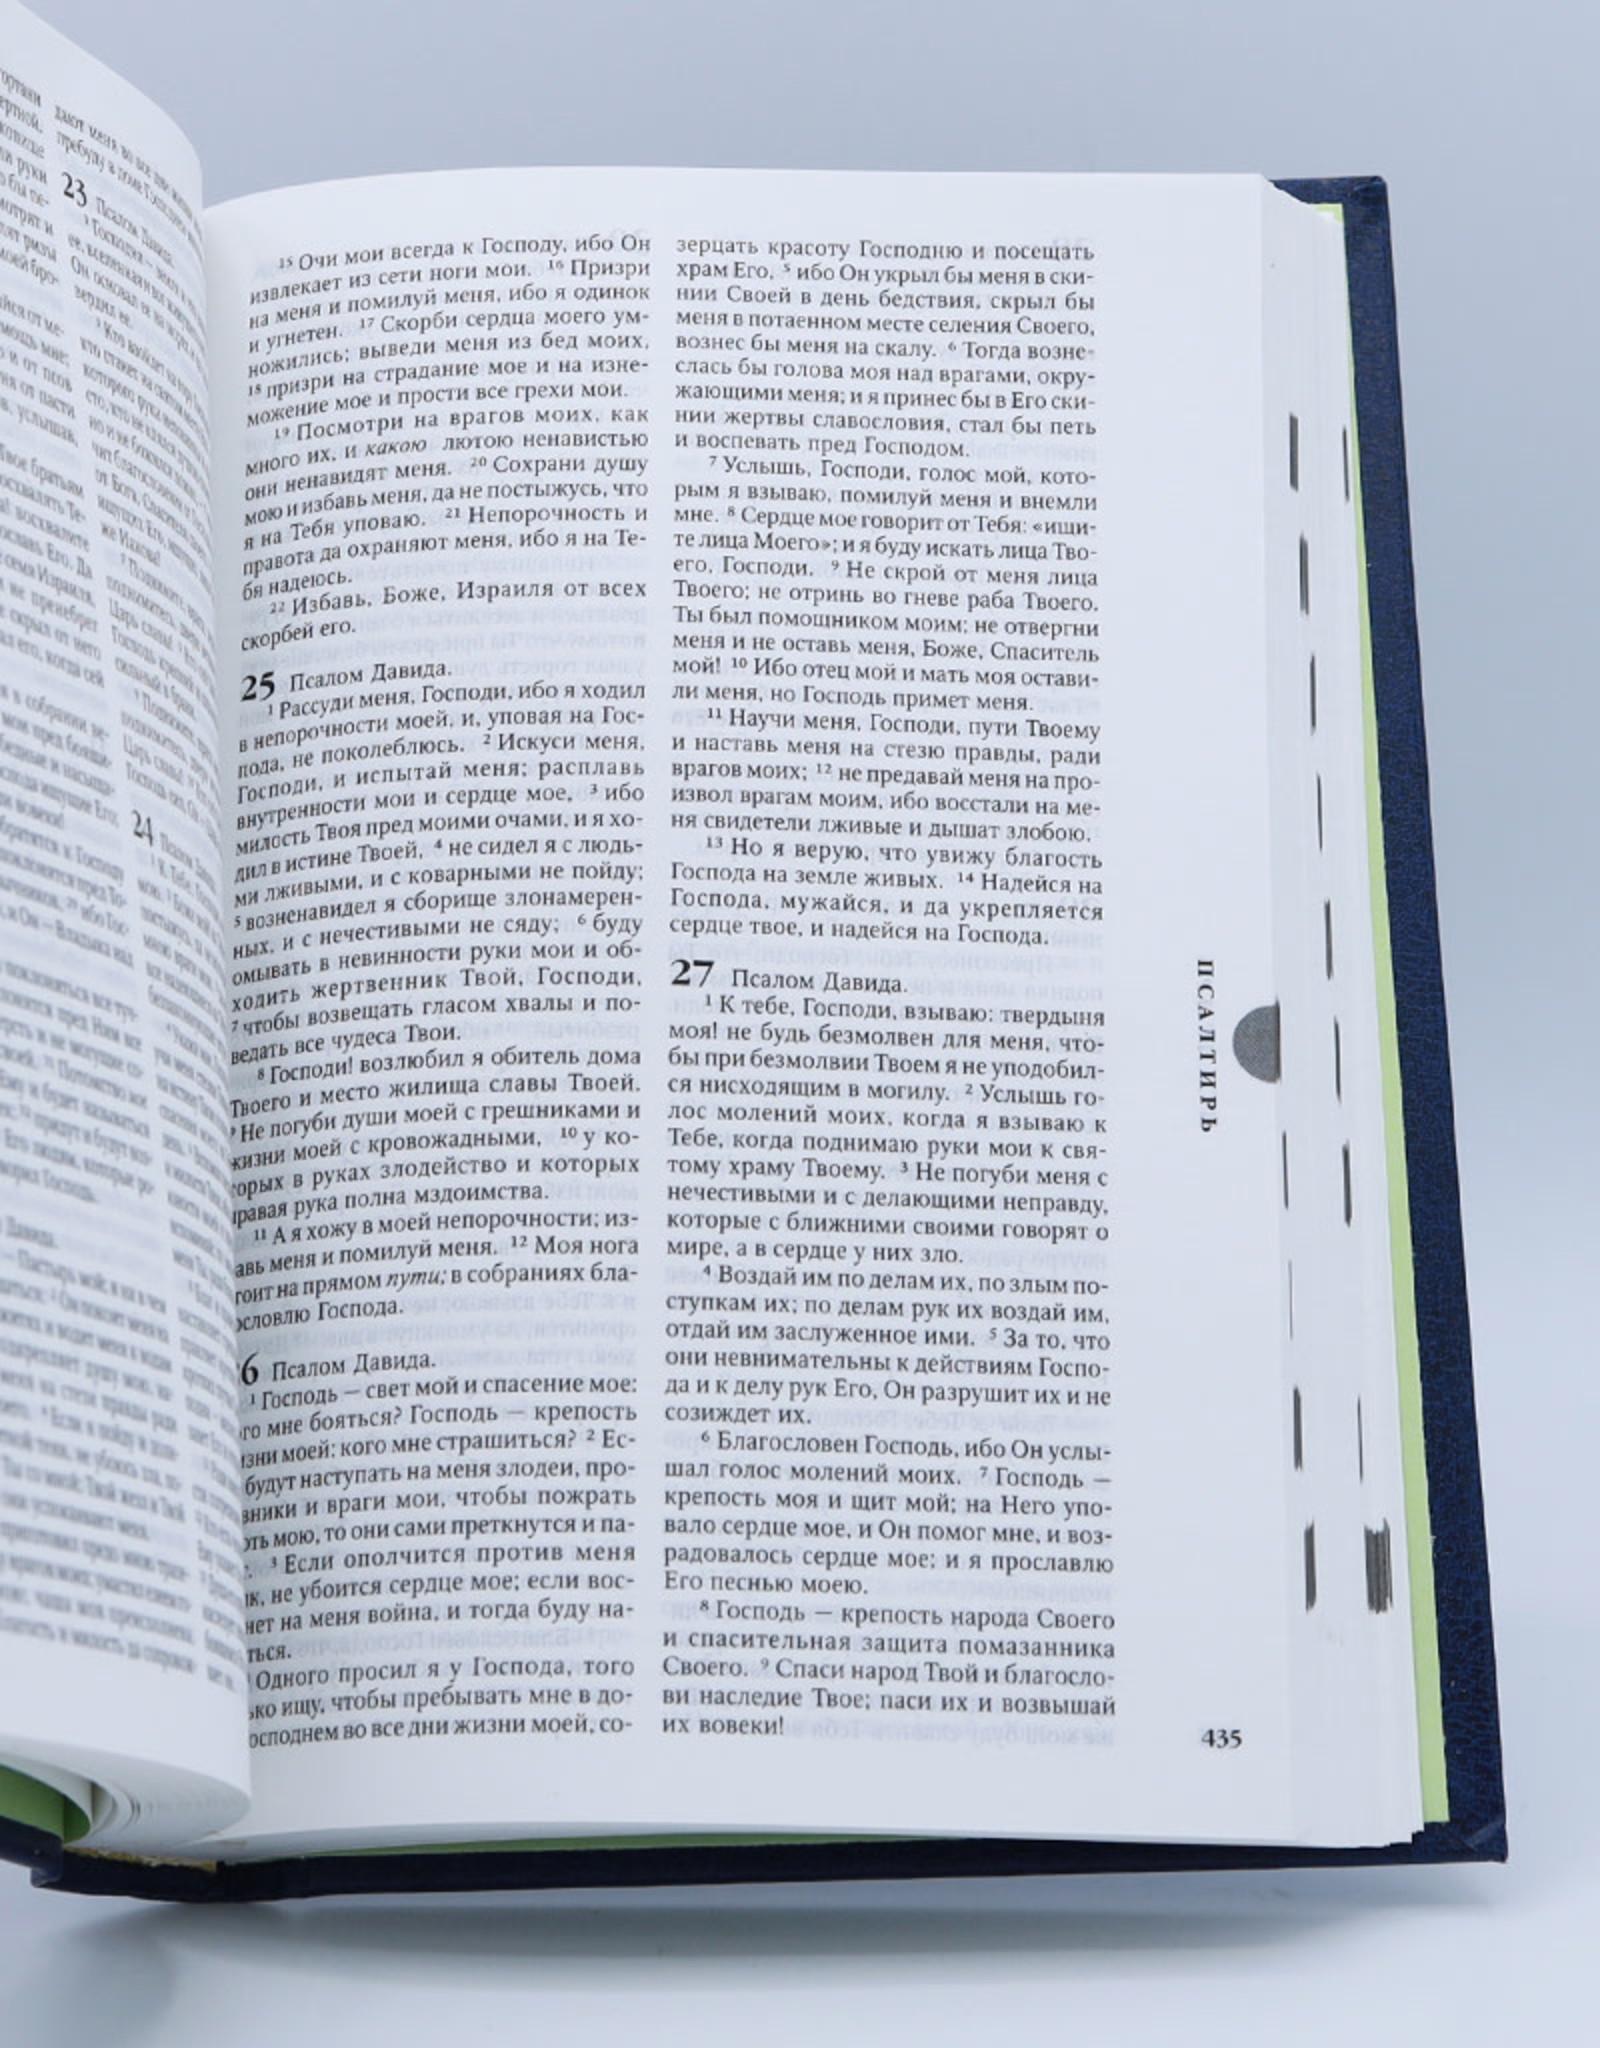 Библия, Каноническая (SYNO) Small Navy Hardcover